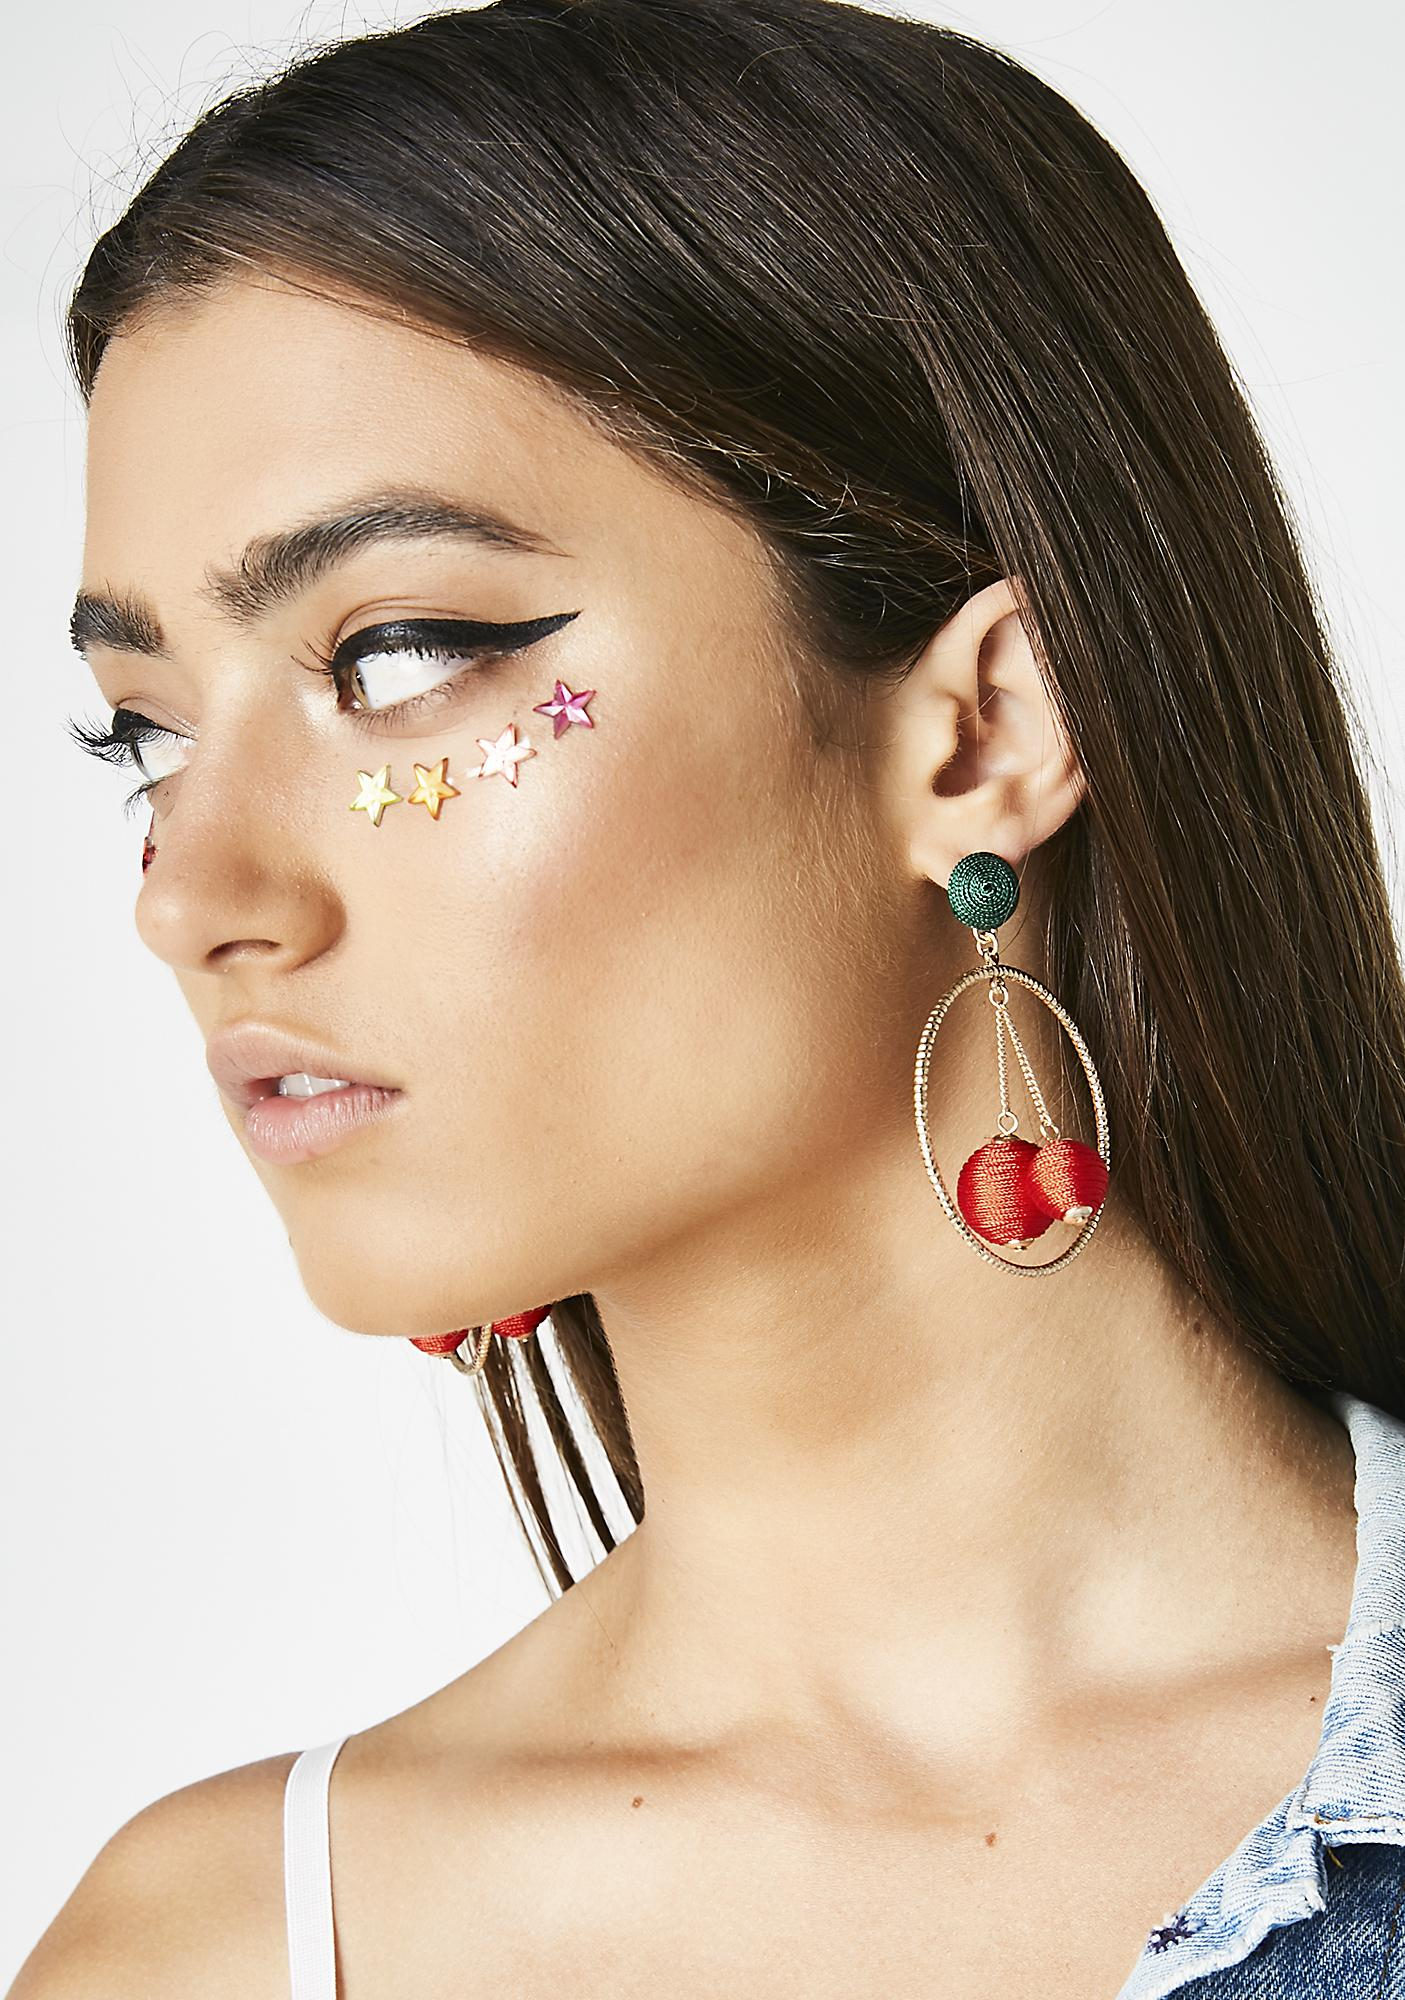 Wild Cherry Child Earrings